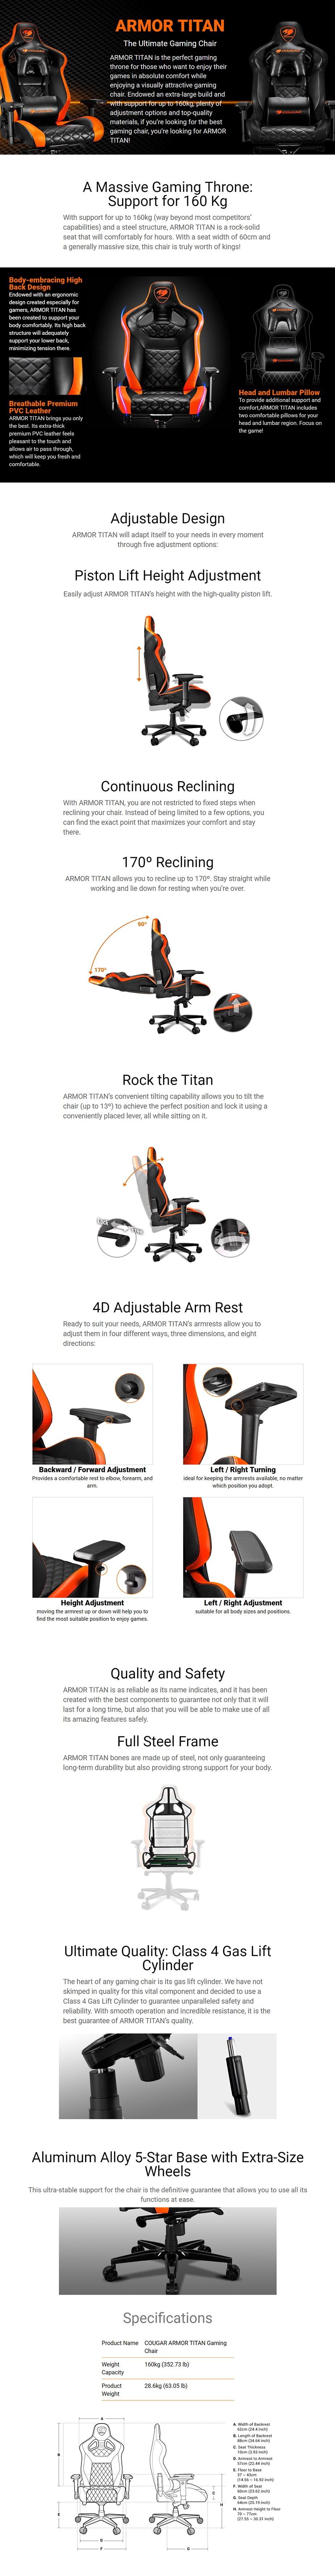 Cougar Armor Titan Gaming Chair - Black/Orange - Desktop Overview 1